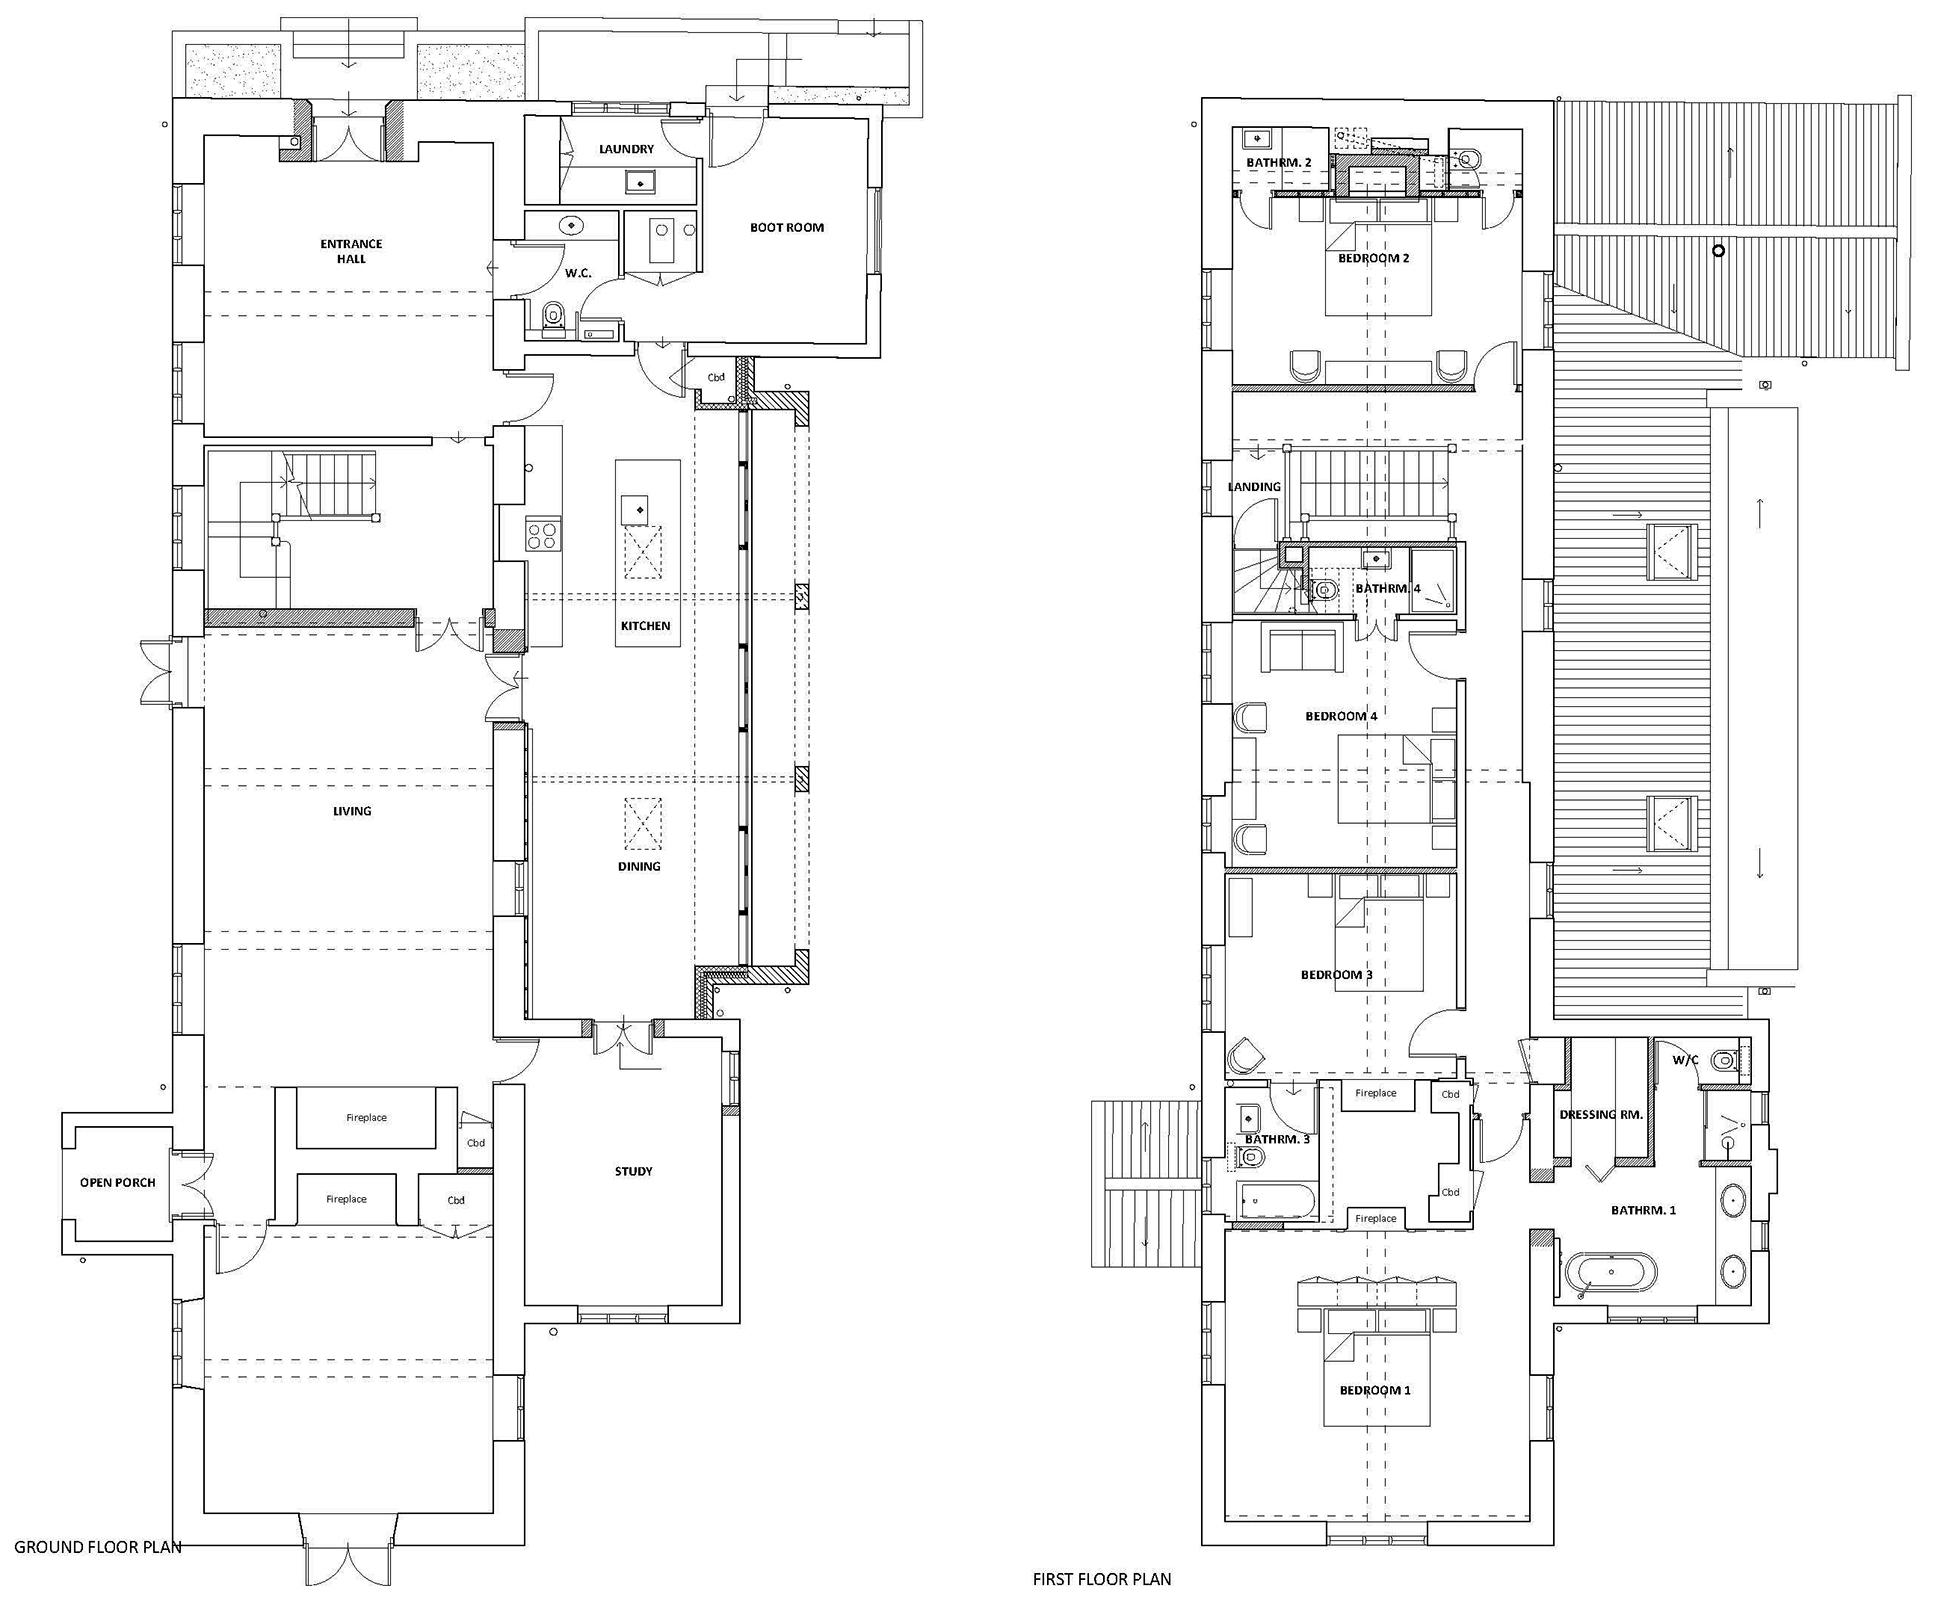 1009 - 300 - Proposed - Main House_1 web 2016.jpg